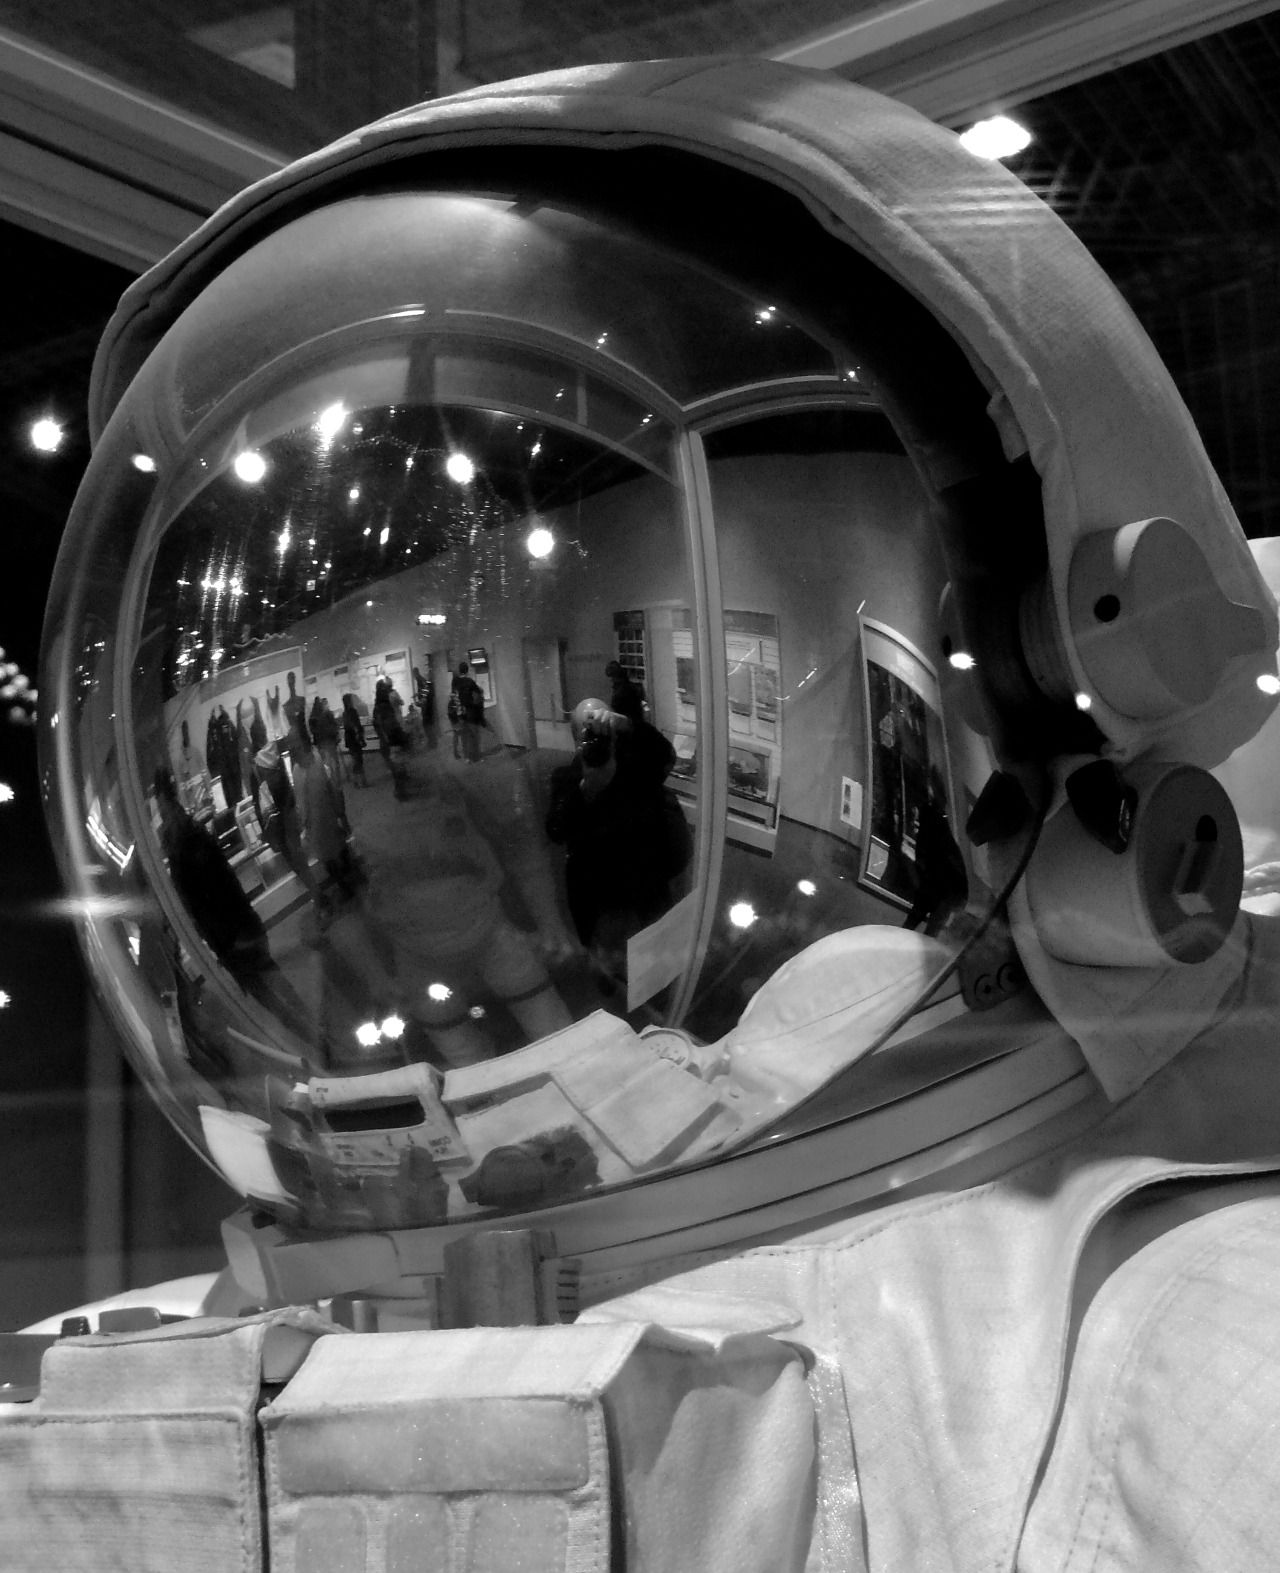 Selfie on Gort-like helmet